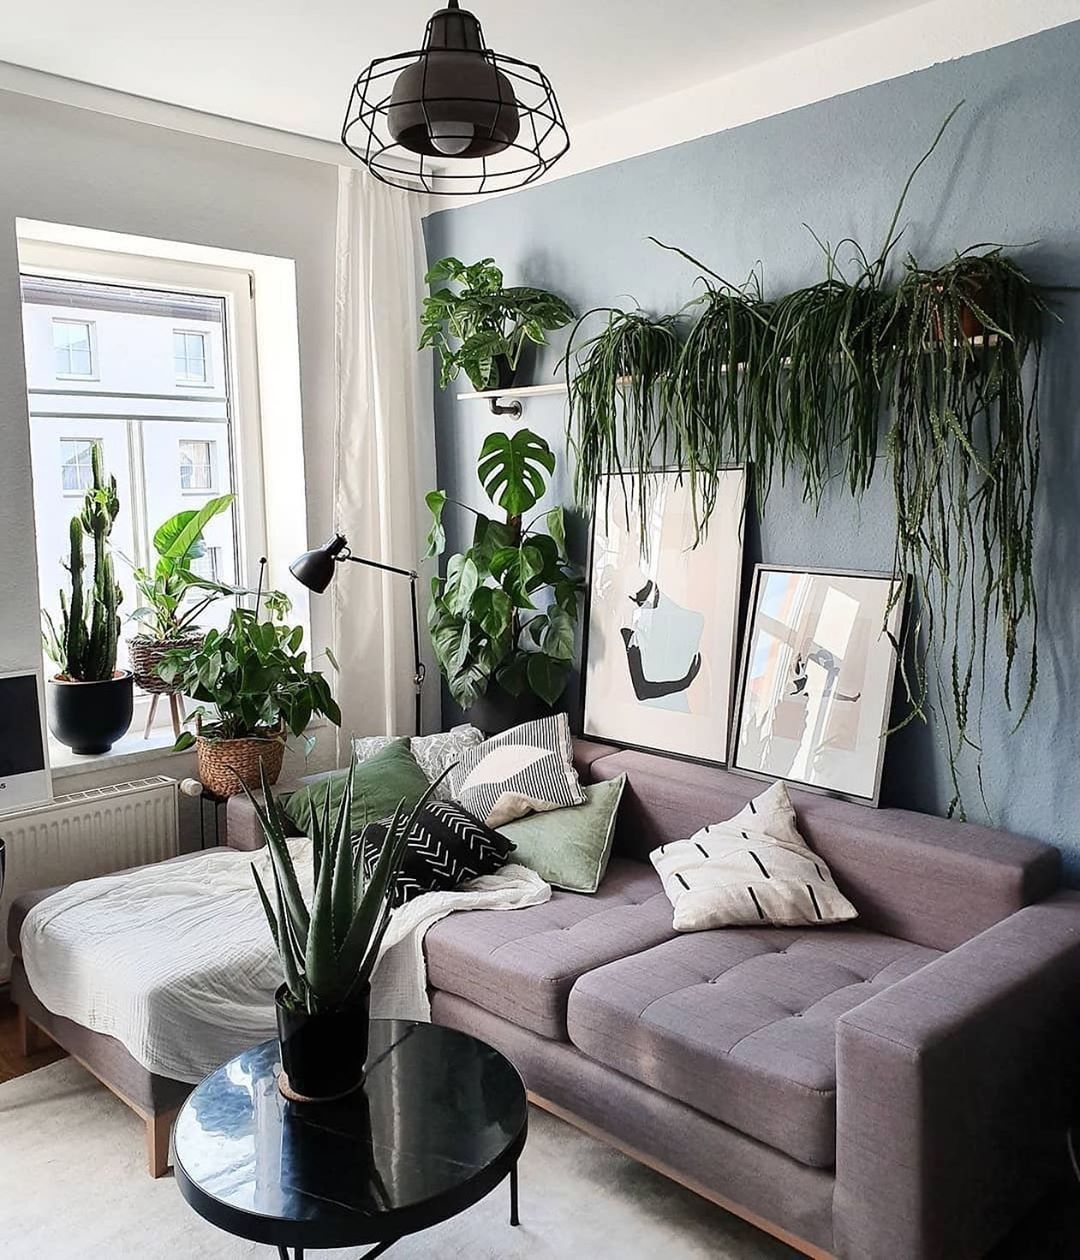 New Stylish Bohemian Home Decor And Design Ideas Budget Home Decorating Elegant Home Decor Home Decor